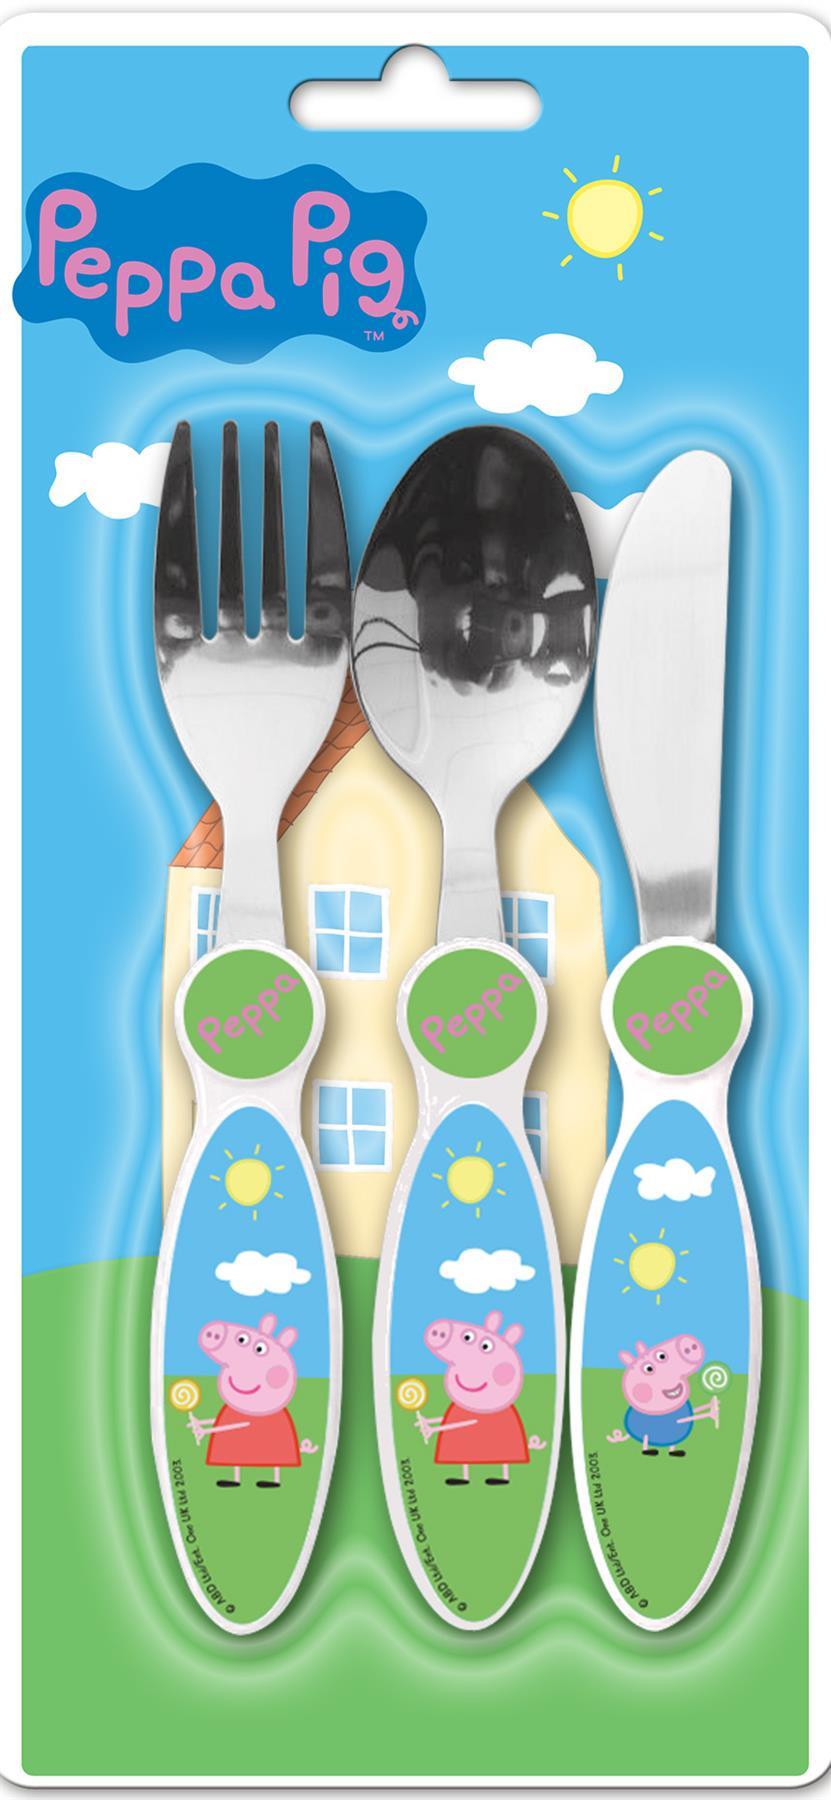 PEPPA PIG 4 Piece Cutlery Fork Spoon Box Set Tableware Pink Gift Toddler Baby UK